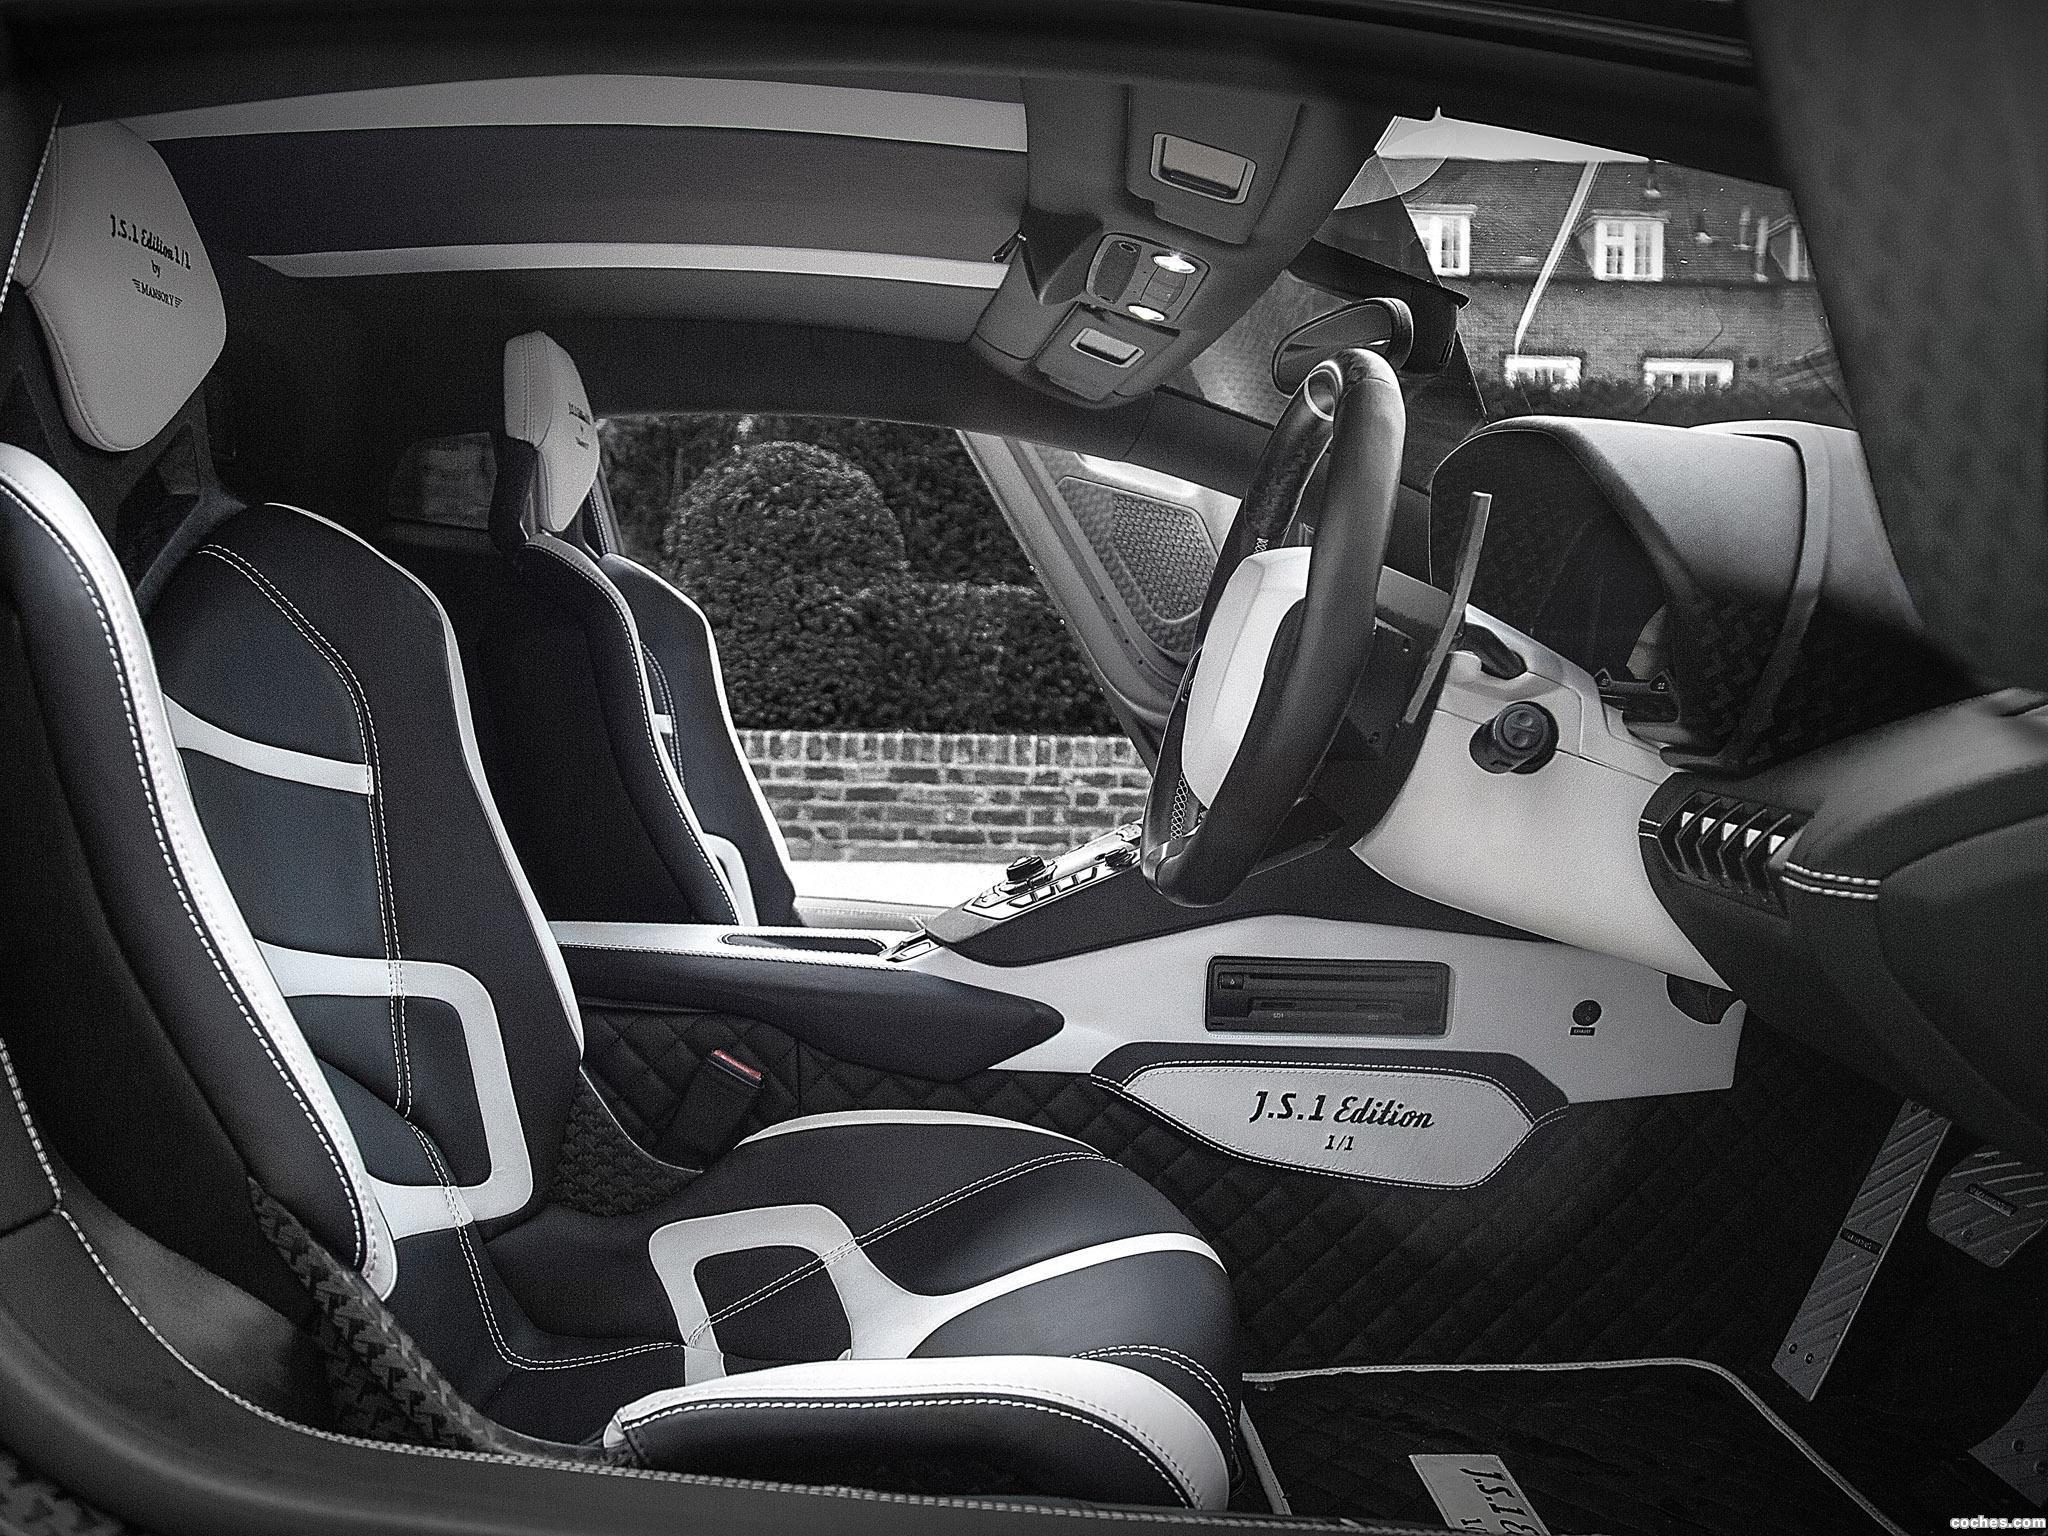 Foto 4 de Mansory Lamborghini Aventador J.S. 1 Edition 2016